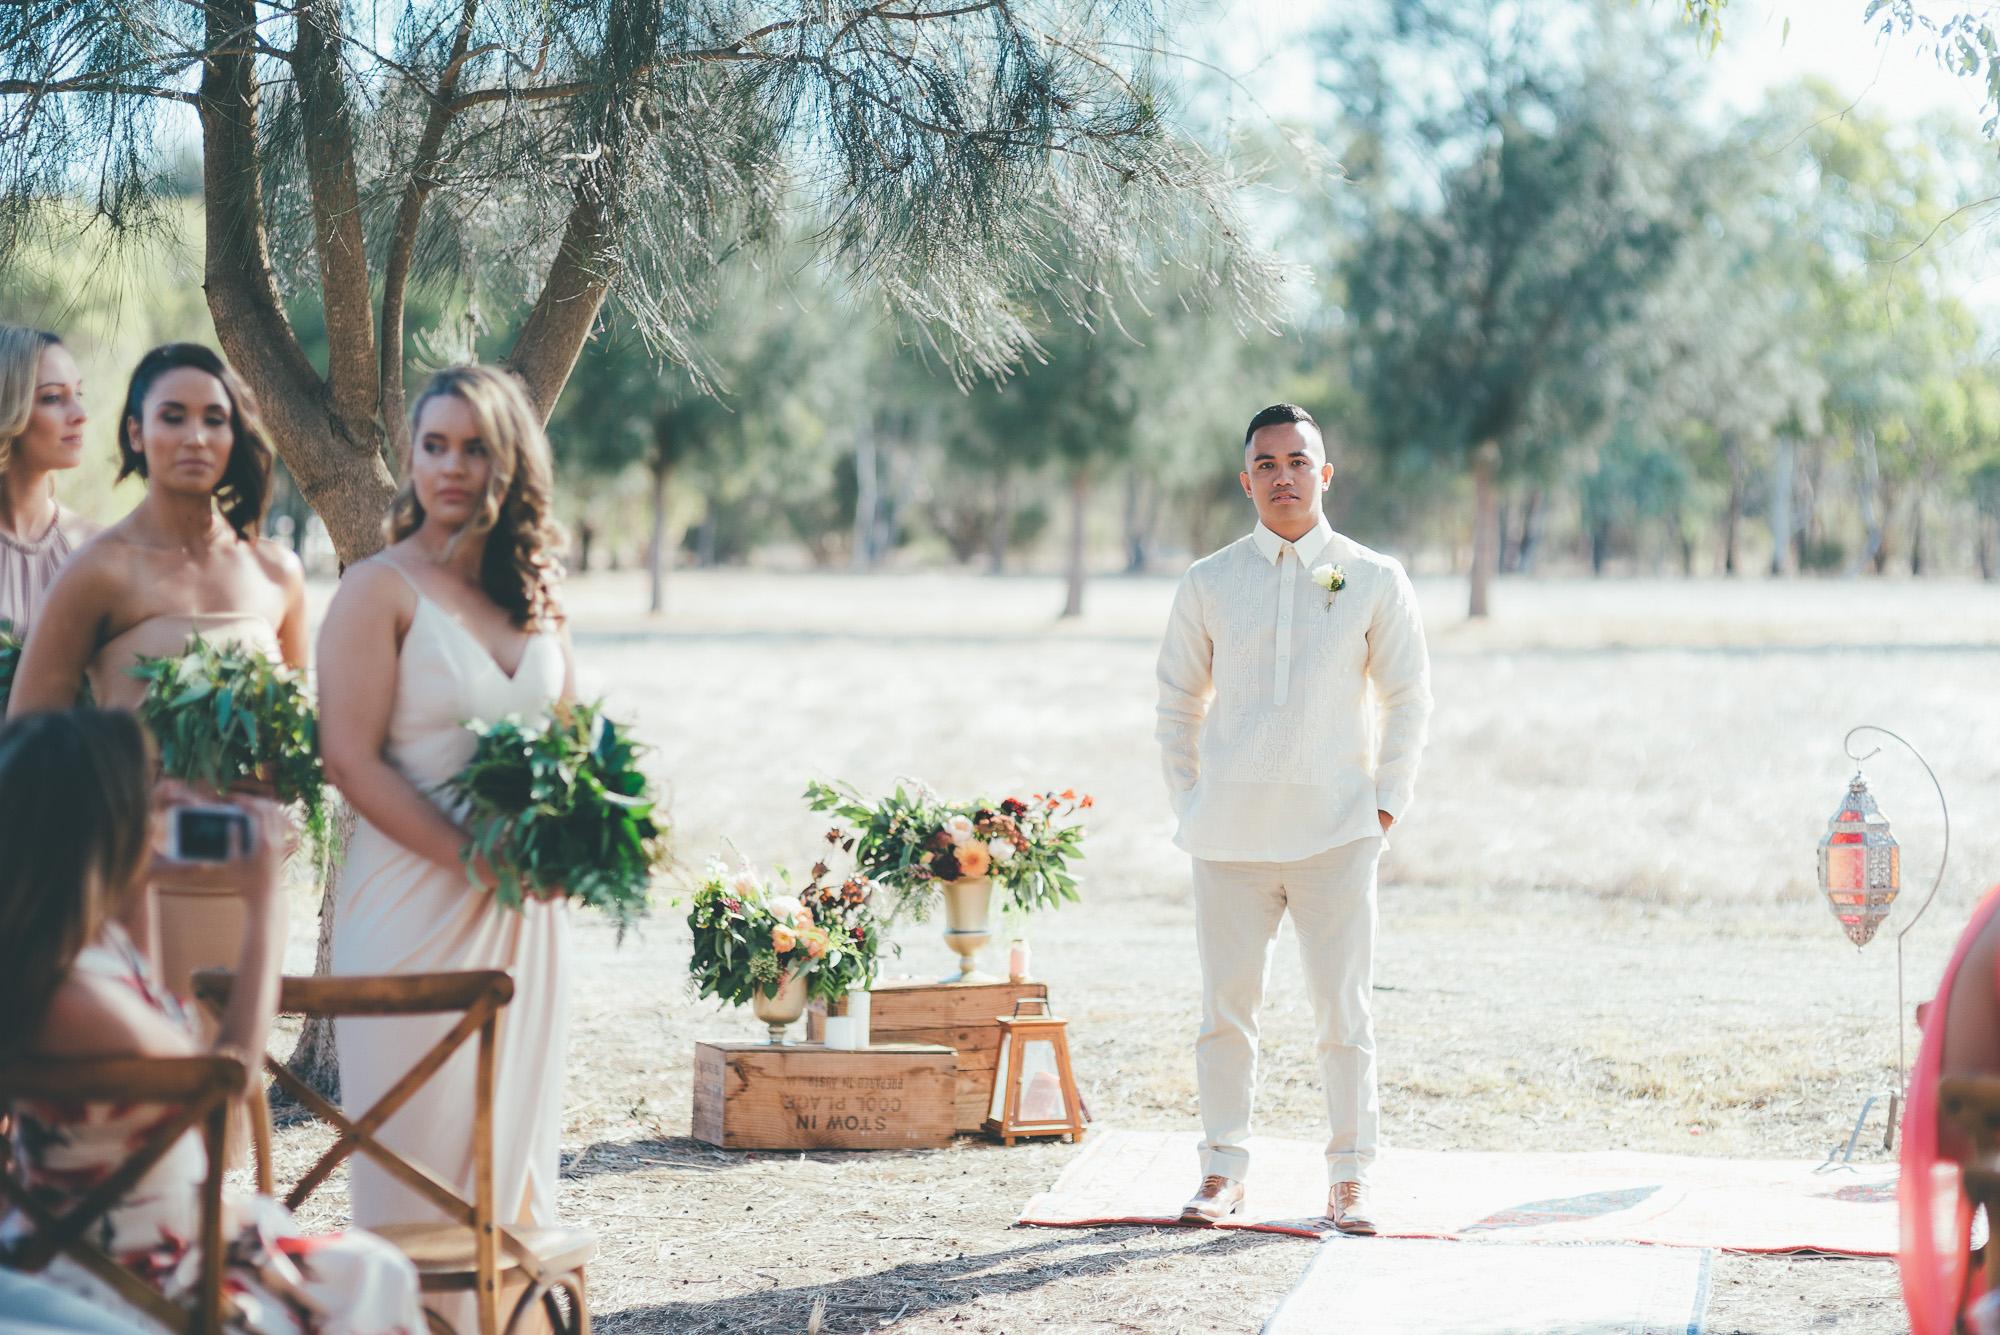 wedding-photographer-outdoor-casual-styled-los-angeles-australia-california-international-earthbound -28.jpg